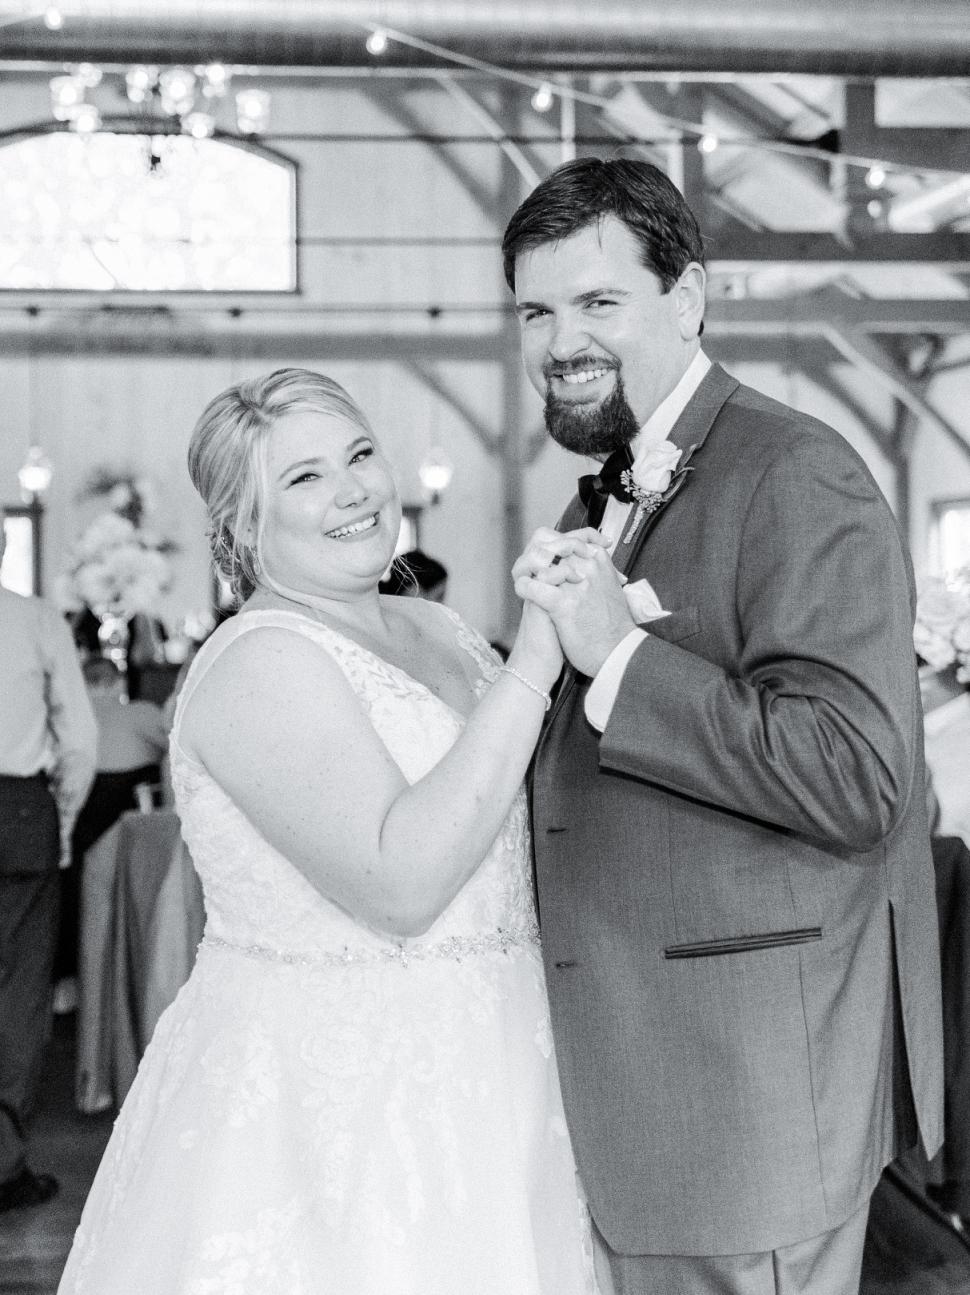 Pennsylvania-Wedding-Photographer-Cassi-Claire-Rosebank-Winery-Wedding_21.jpg